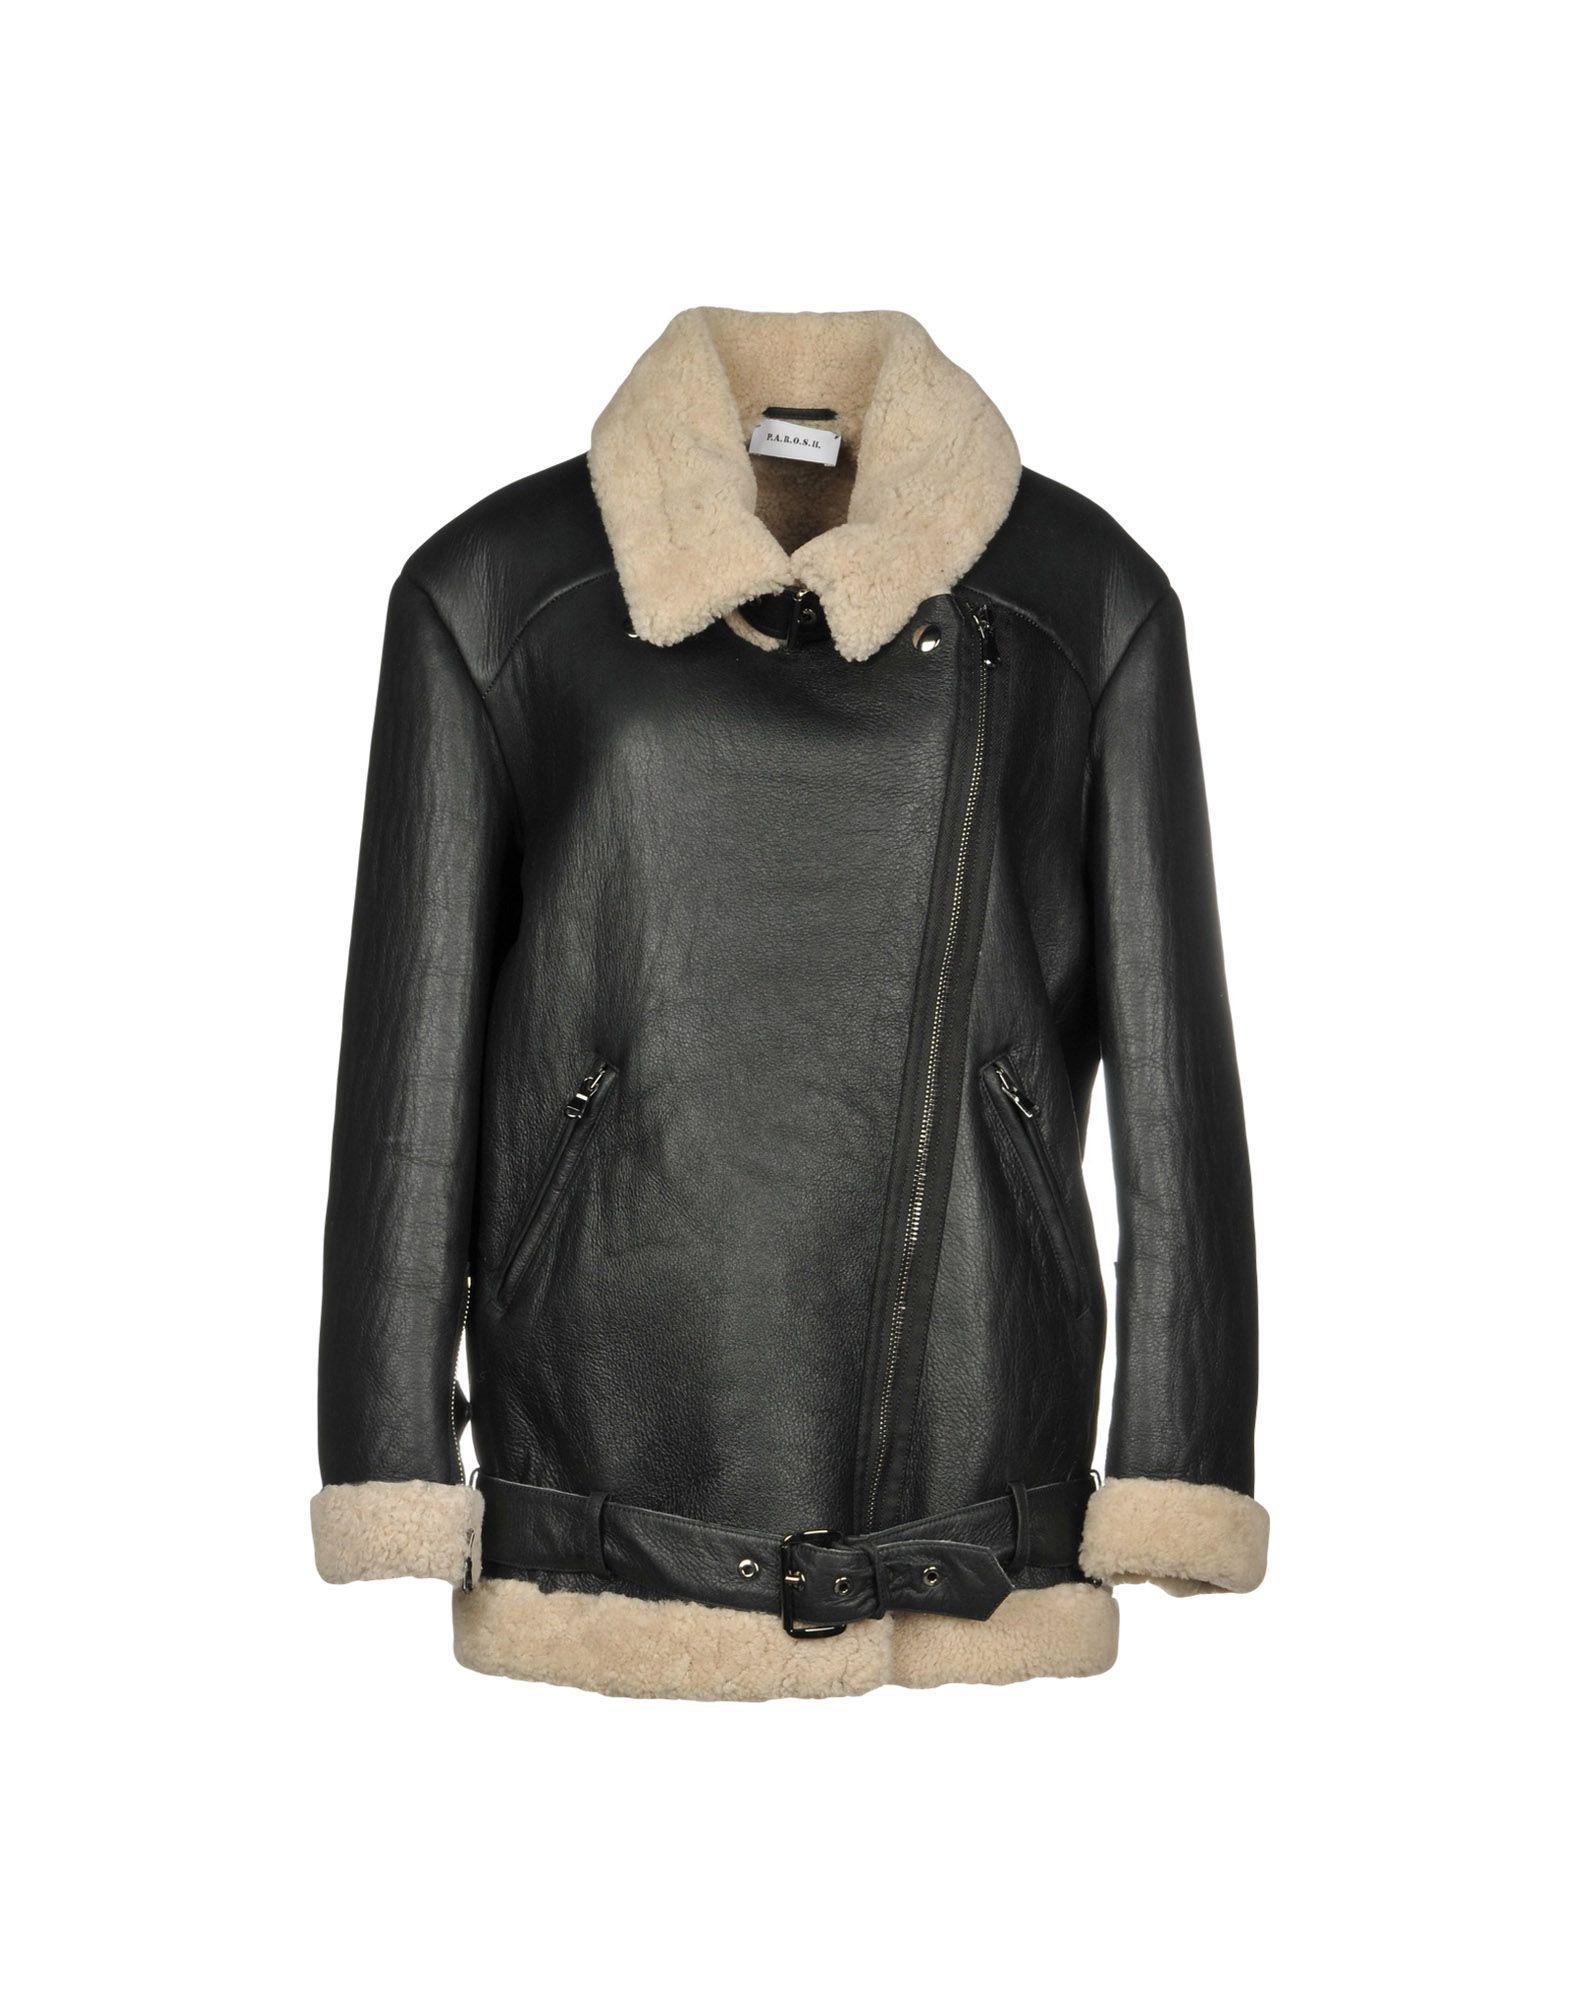 P.A.R.O.S.H. Black Lambskin Leather Jacket